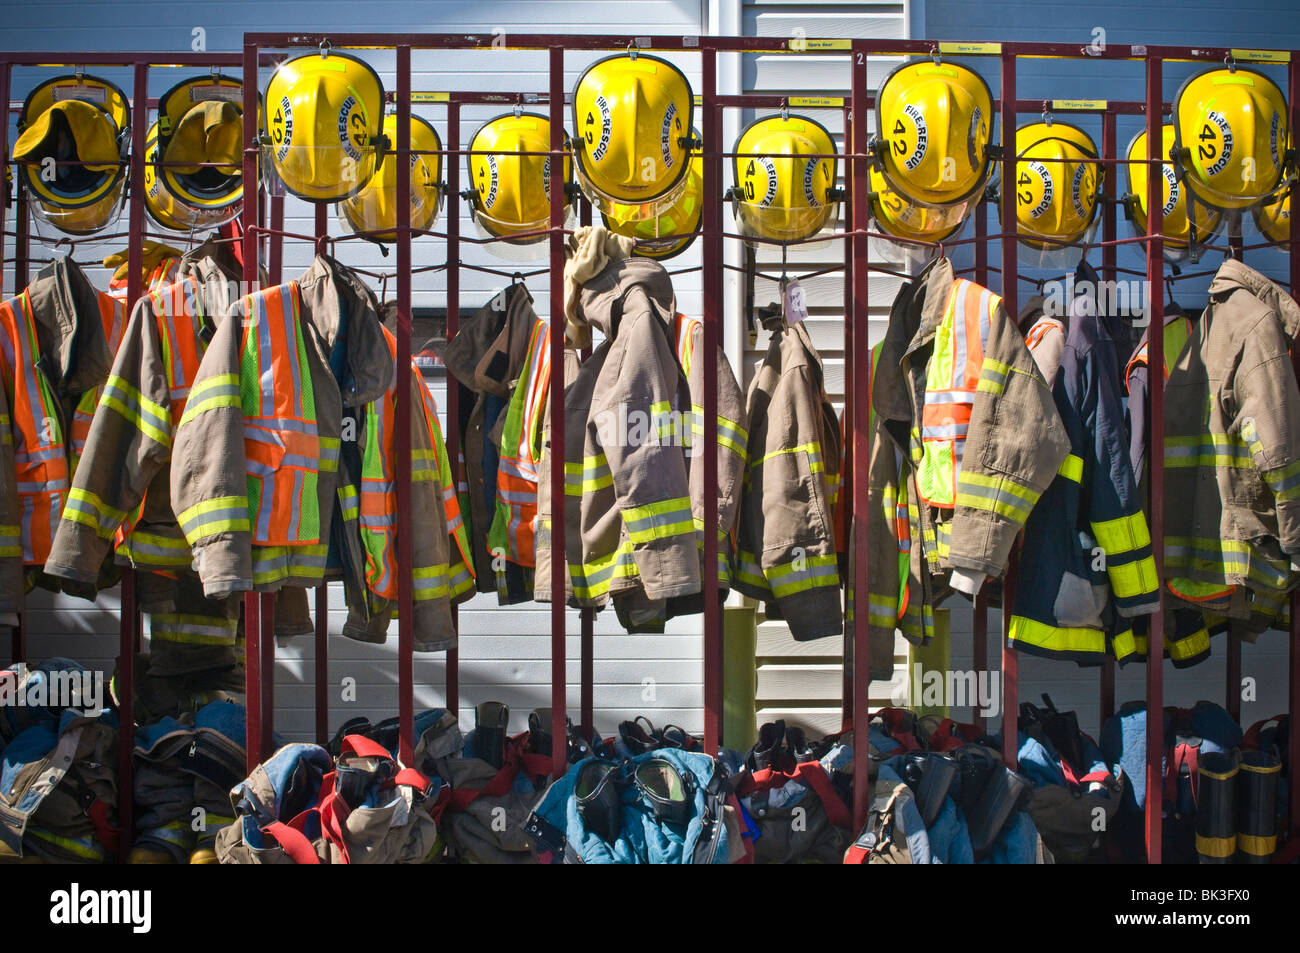 Fireman Old Fashioned Helmet Stock Photos & Fireman Old ...